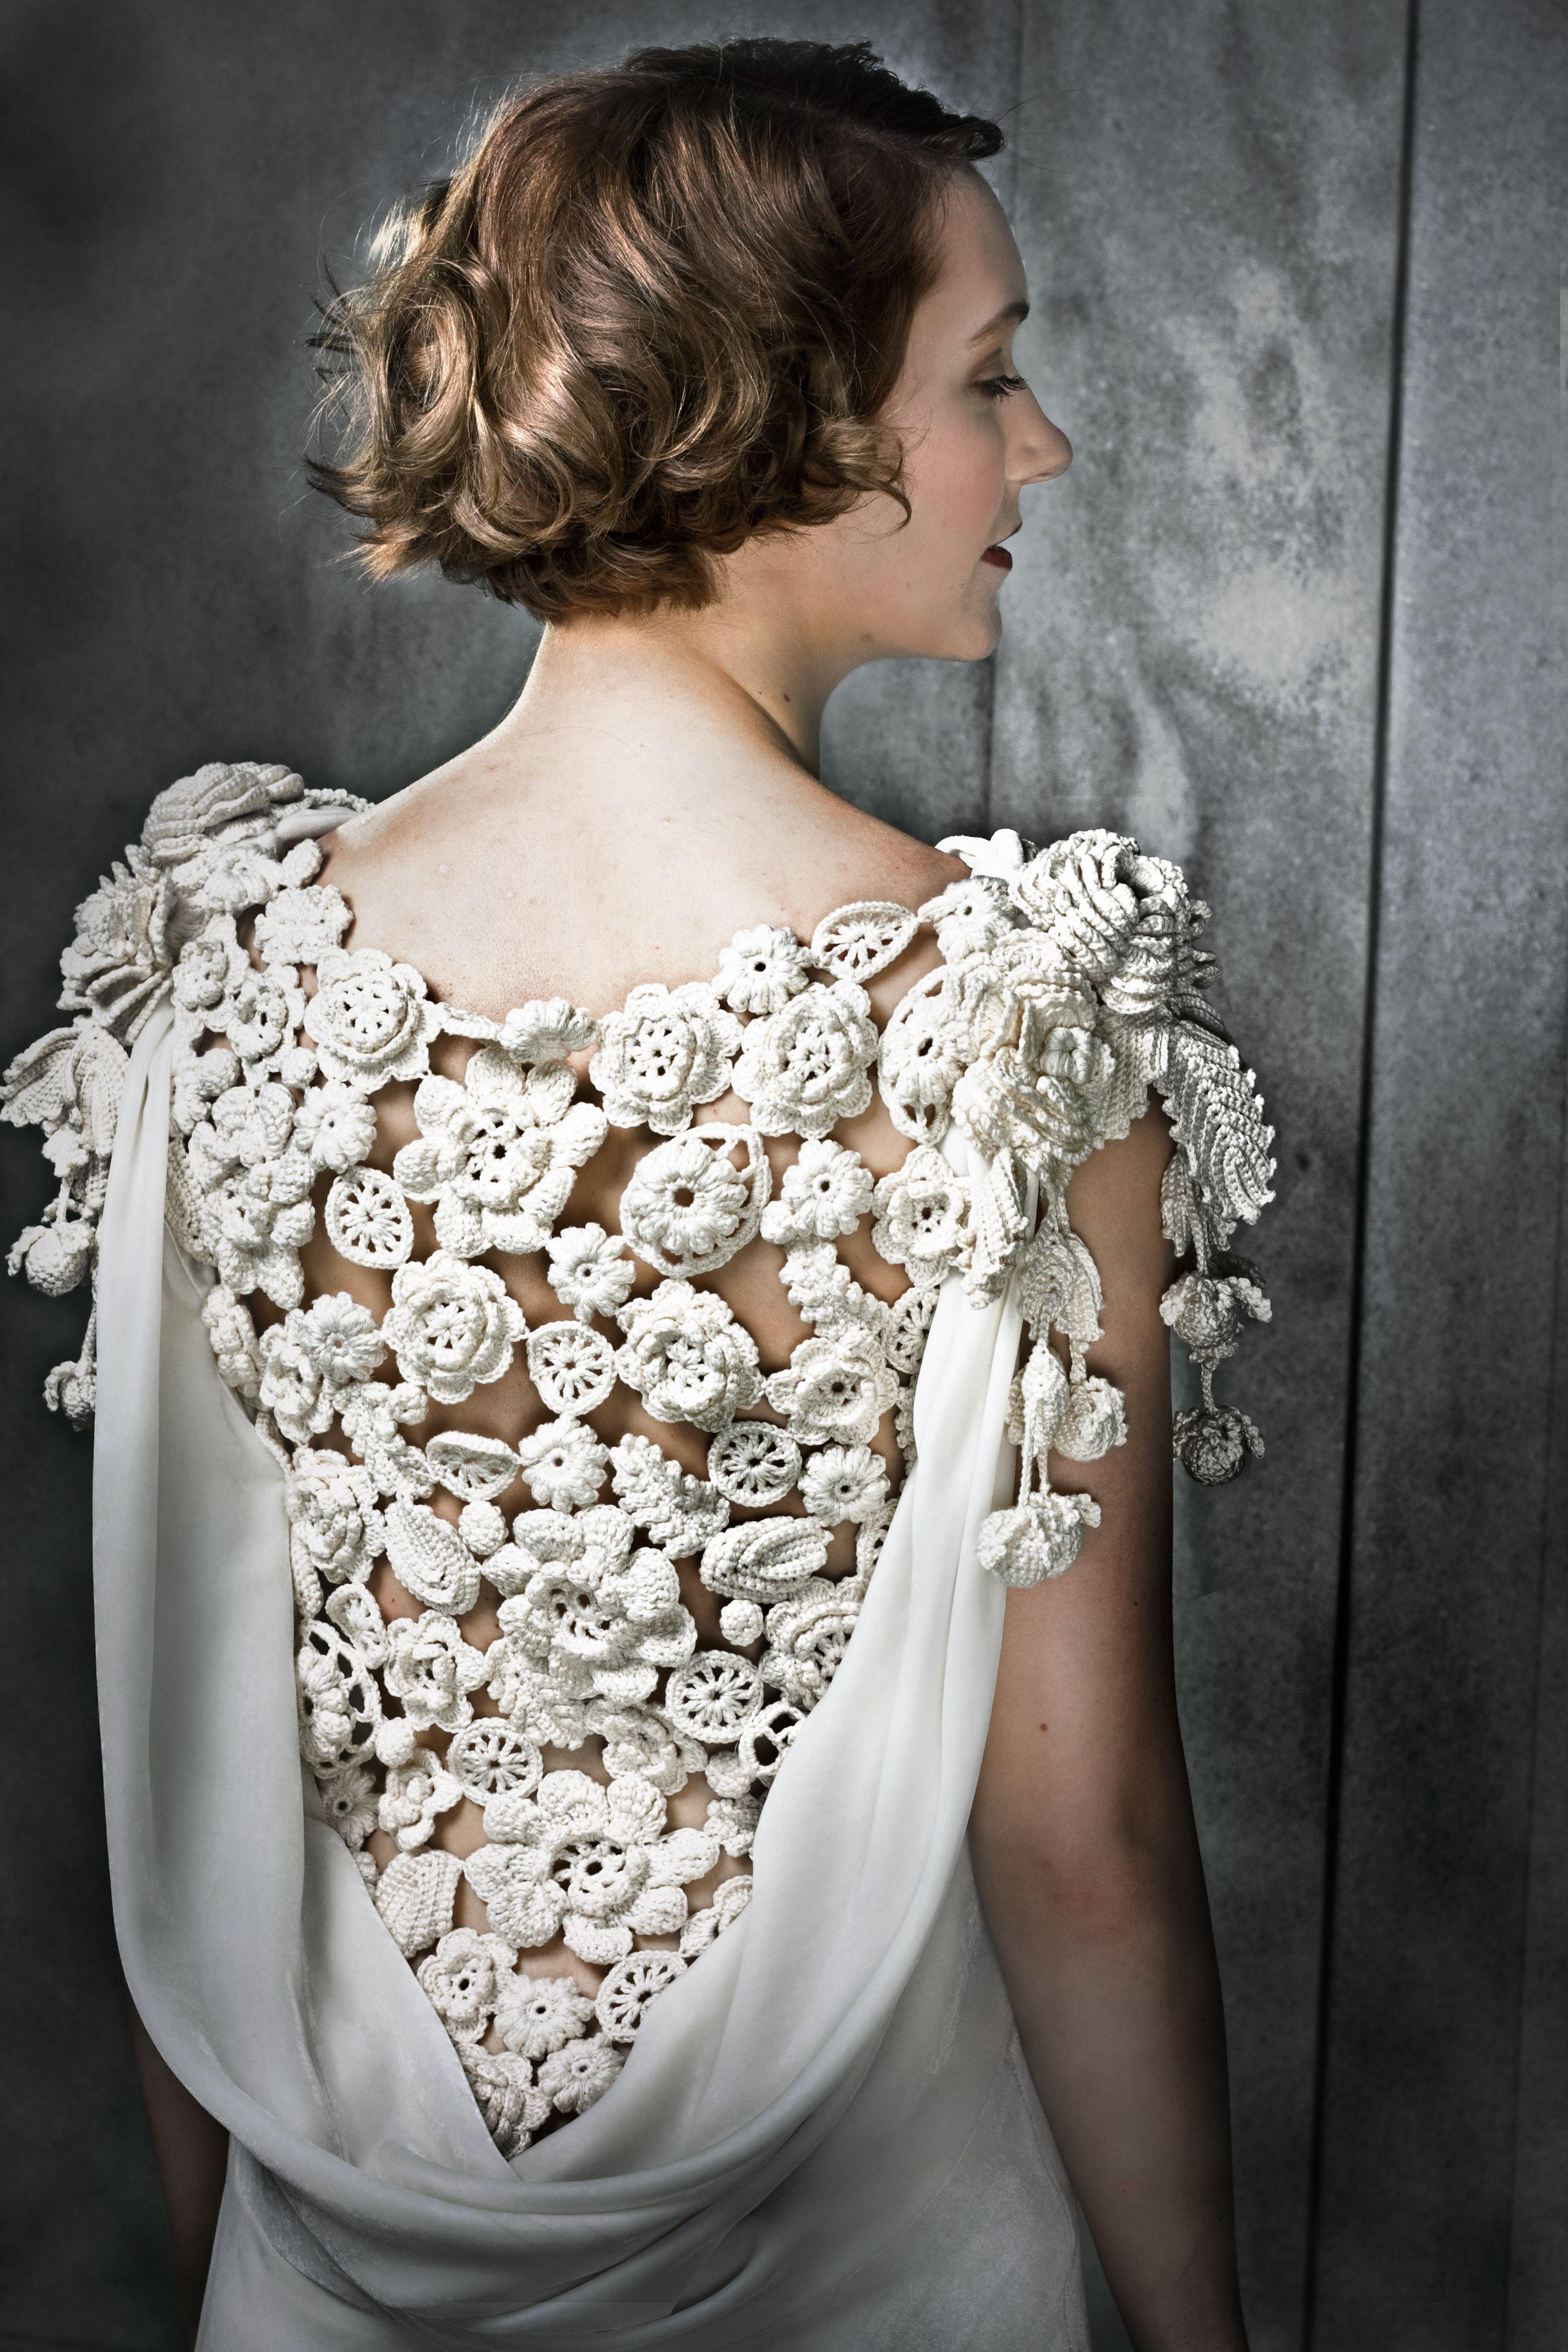 Crochet Wedding Dress Pinterest Fashion Dresses,Nordstrom Wedding Dresses For Mother Of The Groom